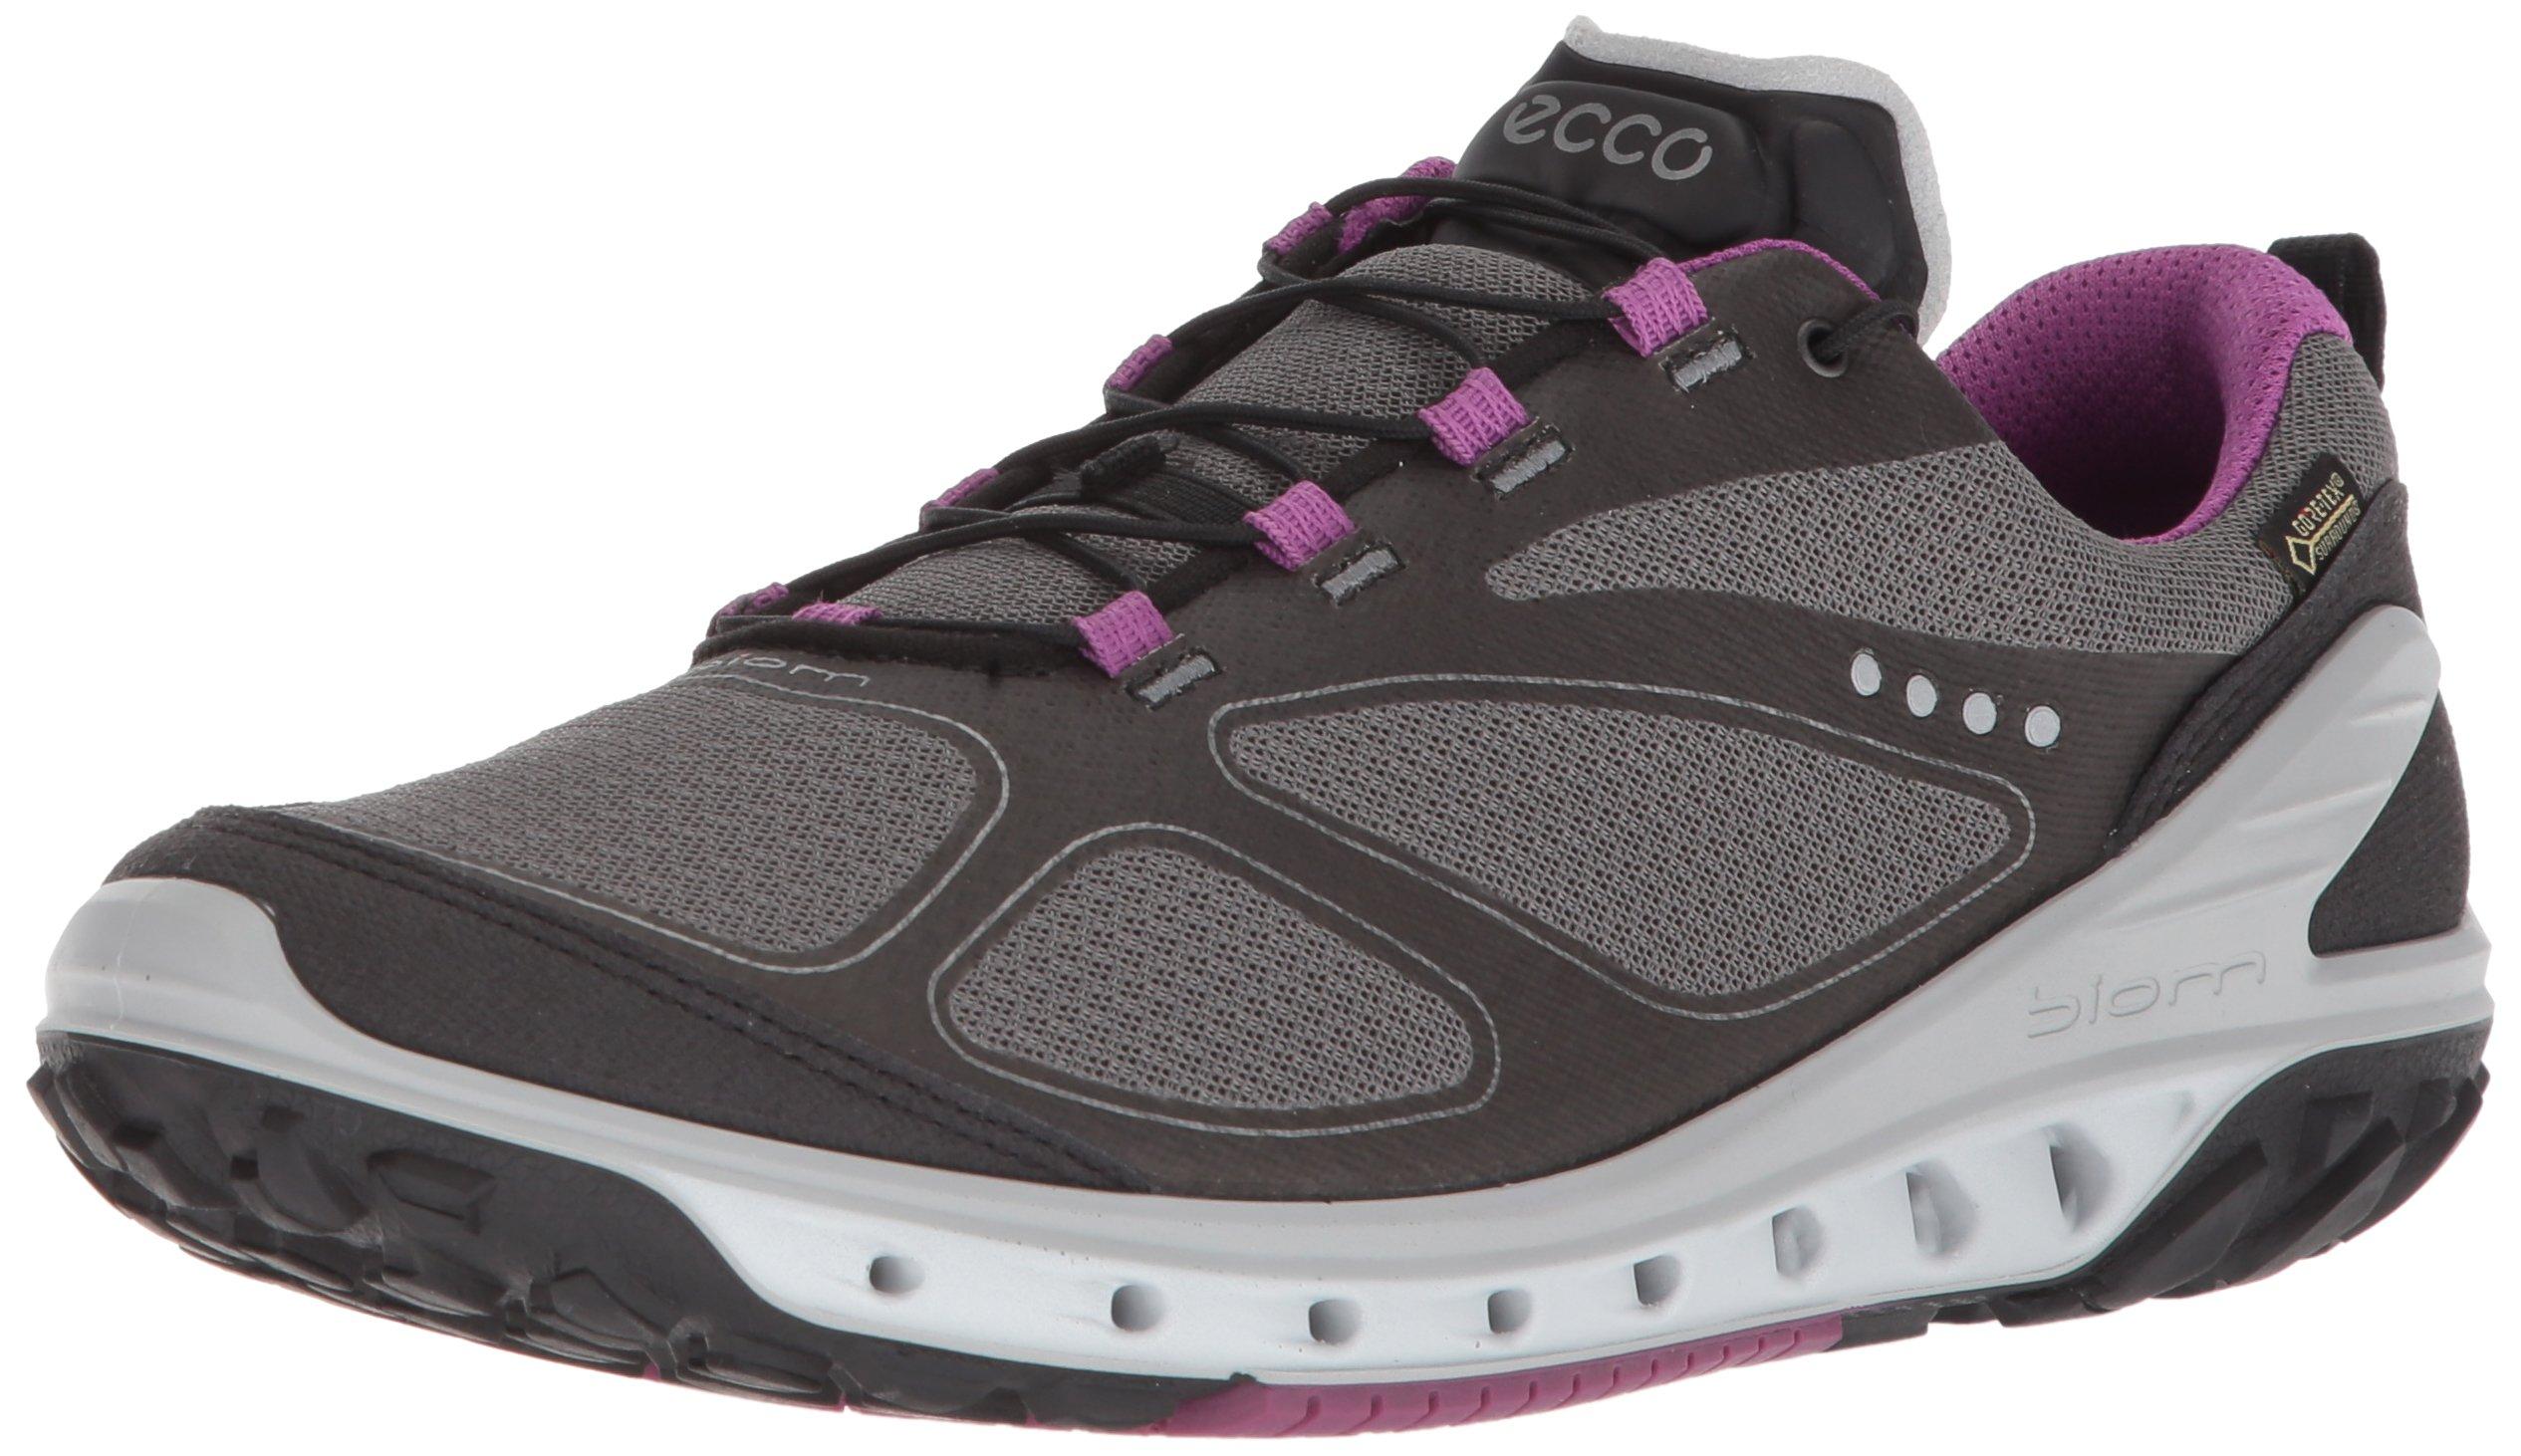 ECCO Women's Biom Venture Gore-TEX Trail Runner, Black/Titanium/Orchid, 37 EU/6-6.5 M US